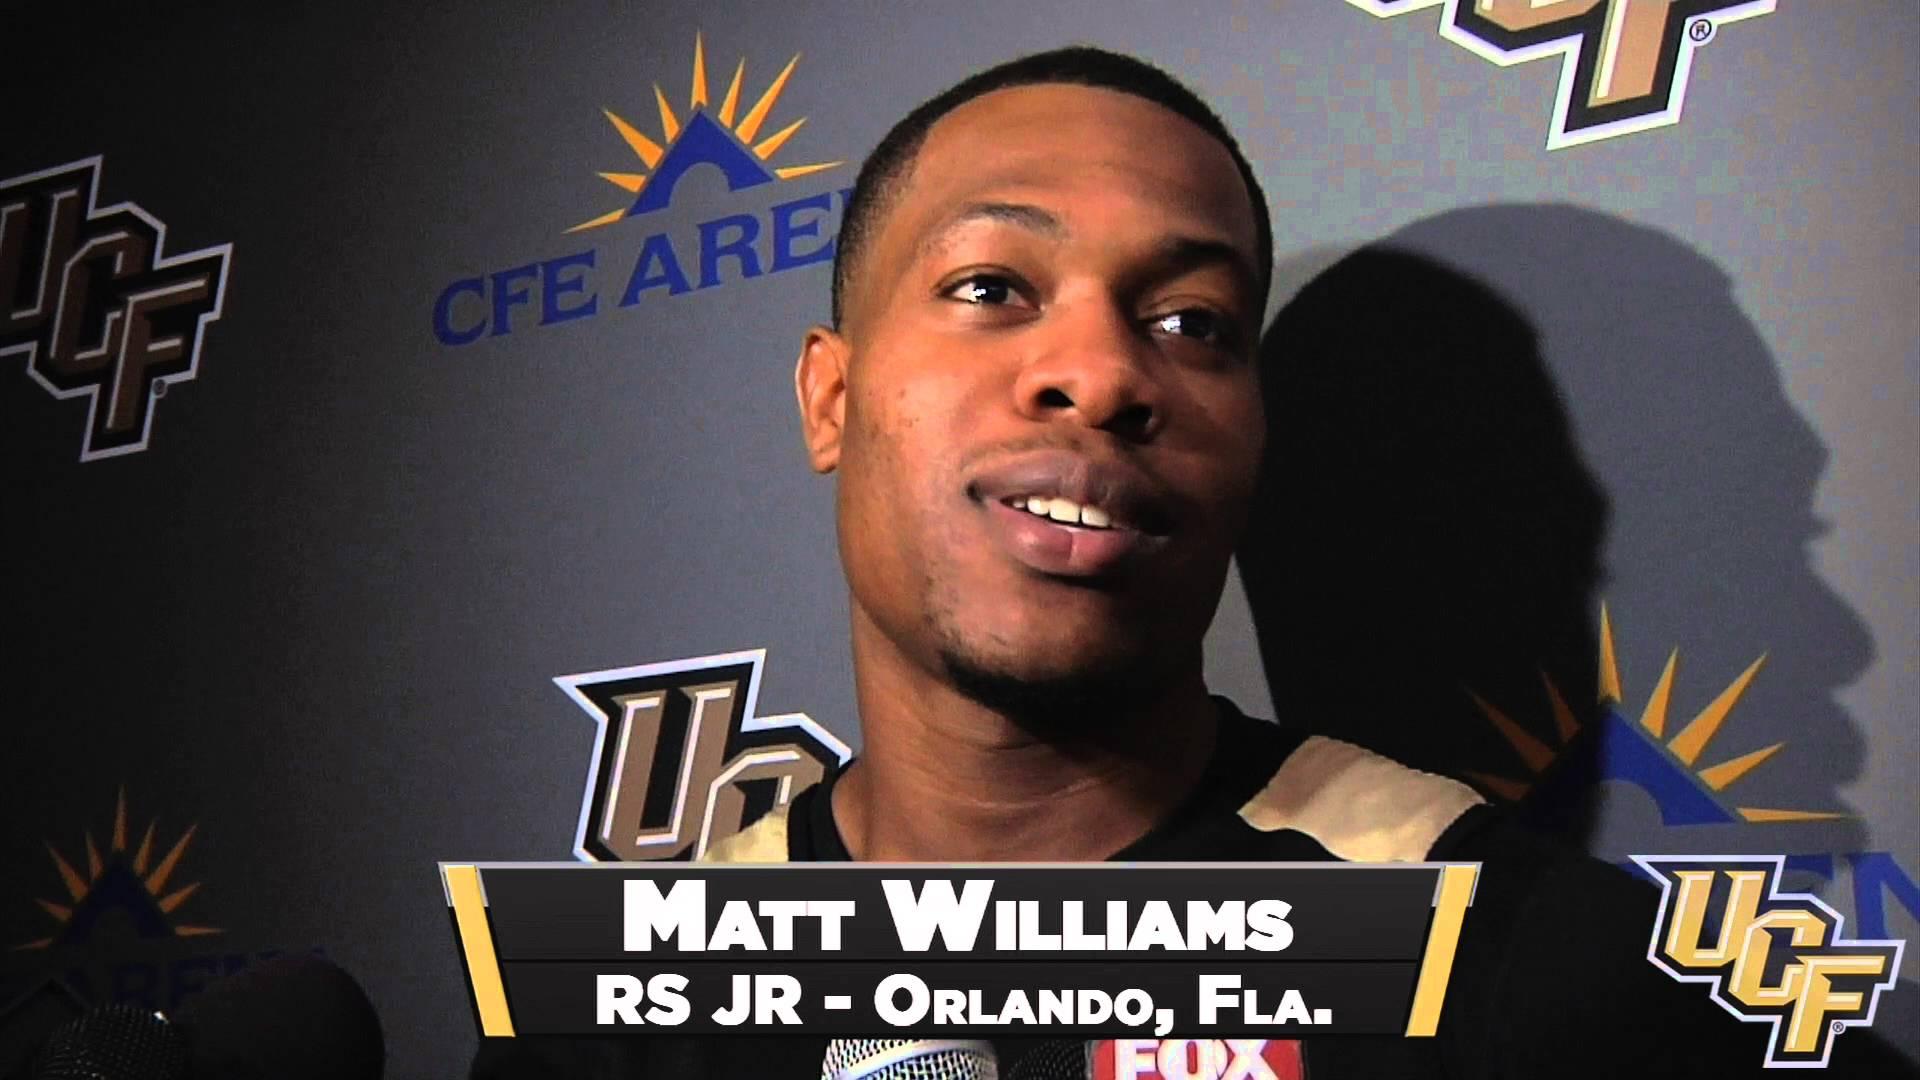 Matt Williams transfer from UCF Johnny Dawkins son es in